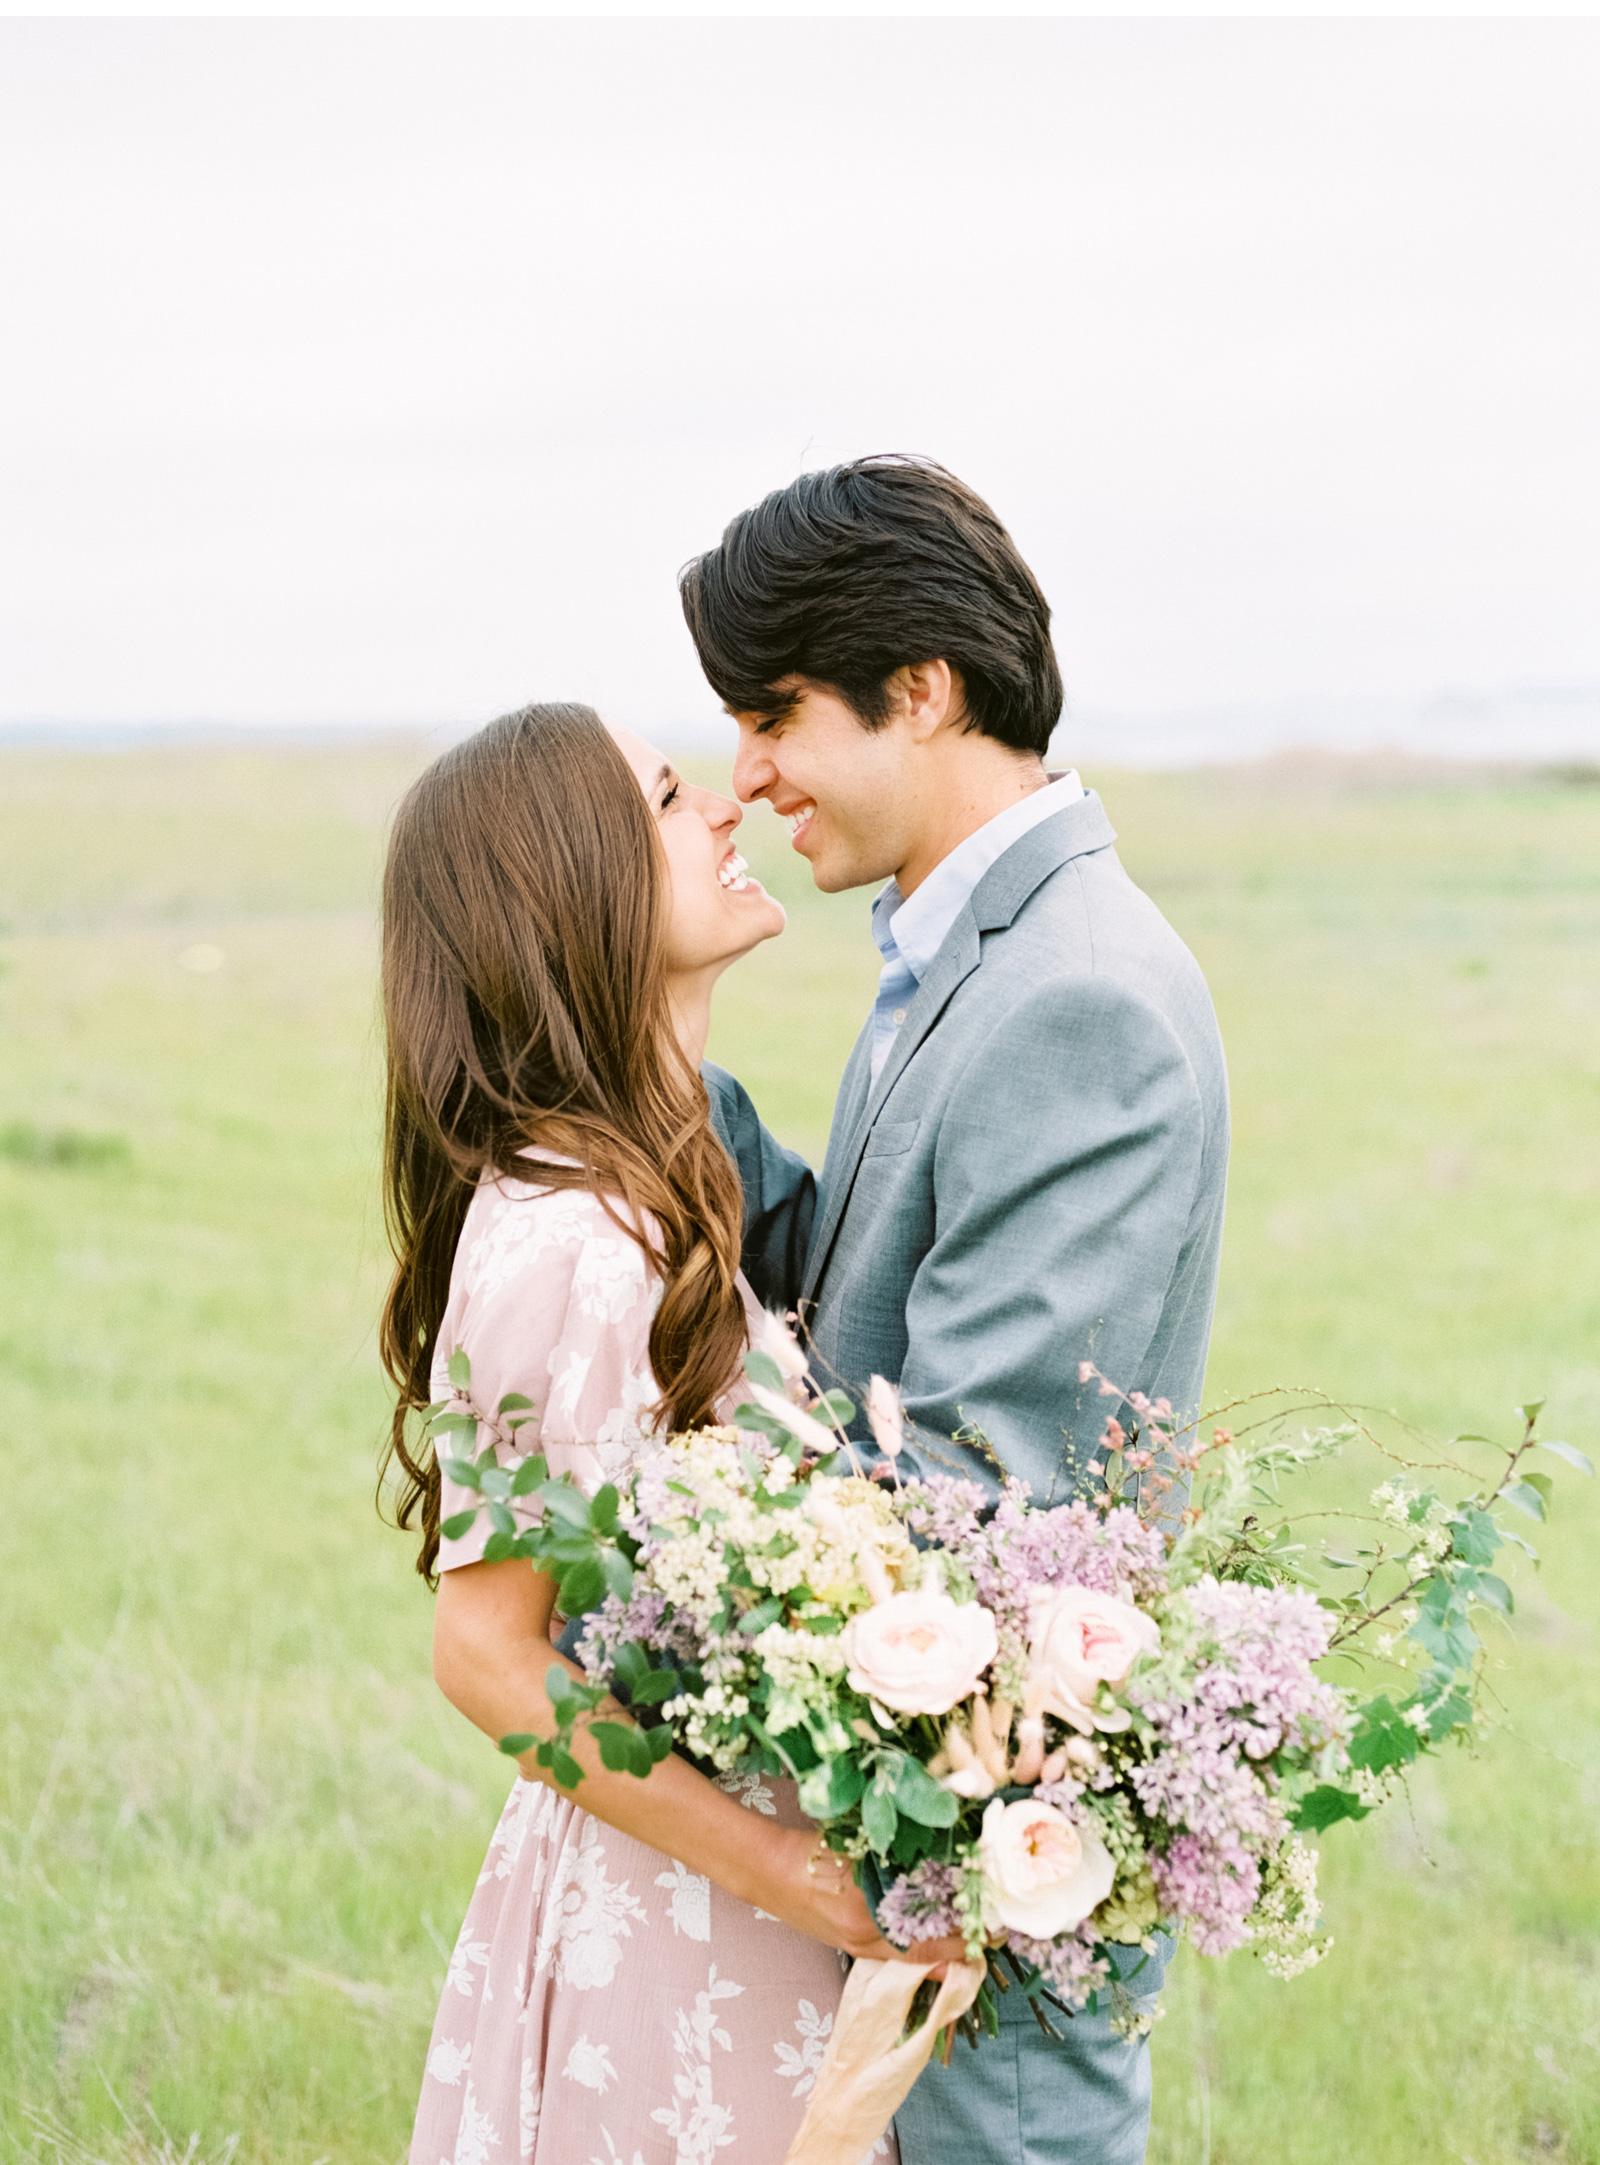 Saddlerock-Ranch-Malibu-Wedding-Natalie-Schutt-Photography-Romantic-Florals-Rolling-Hills-Engagement_07.jpg